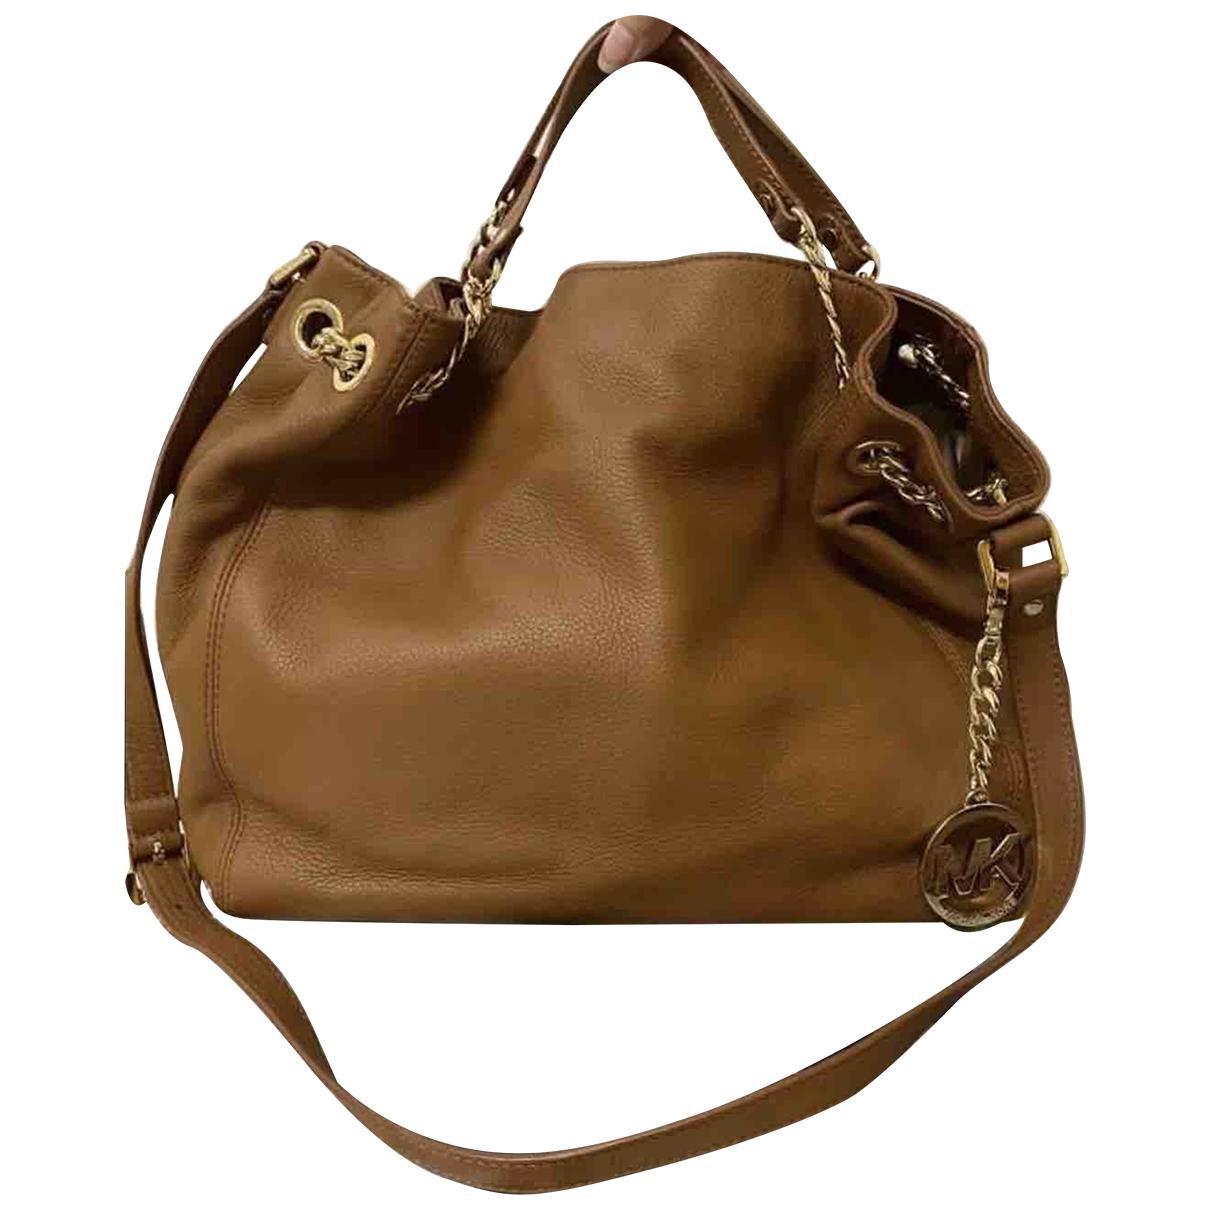 Michael Kors Jet Set Brown Leather handbag for Women N